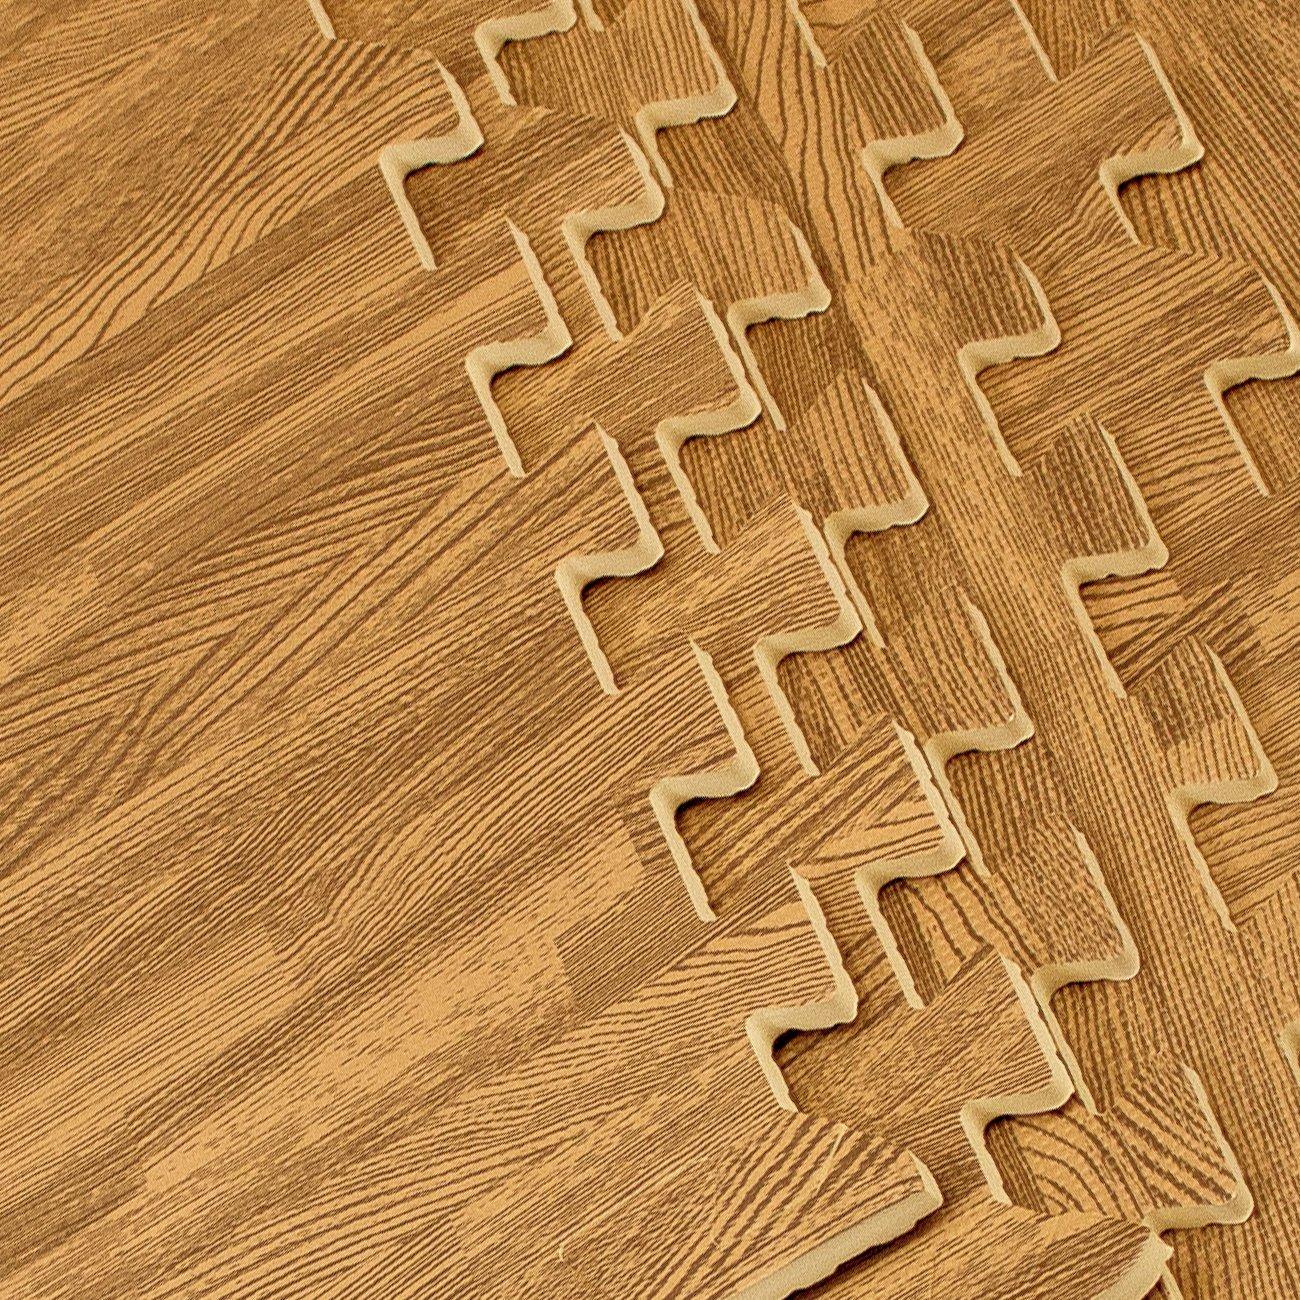 Sorbus Interlocking Floor Mat Print, Wood Grain - Light (6-Piece) by Sorbus (Image #8)